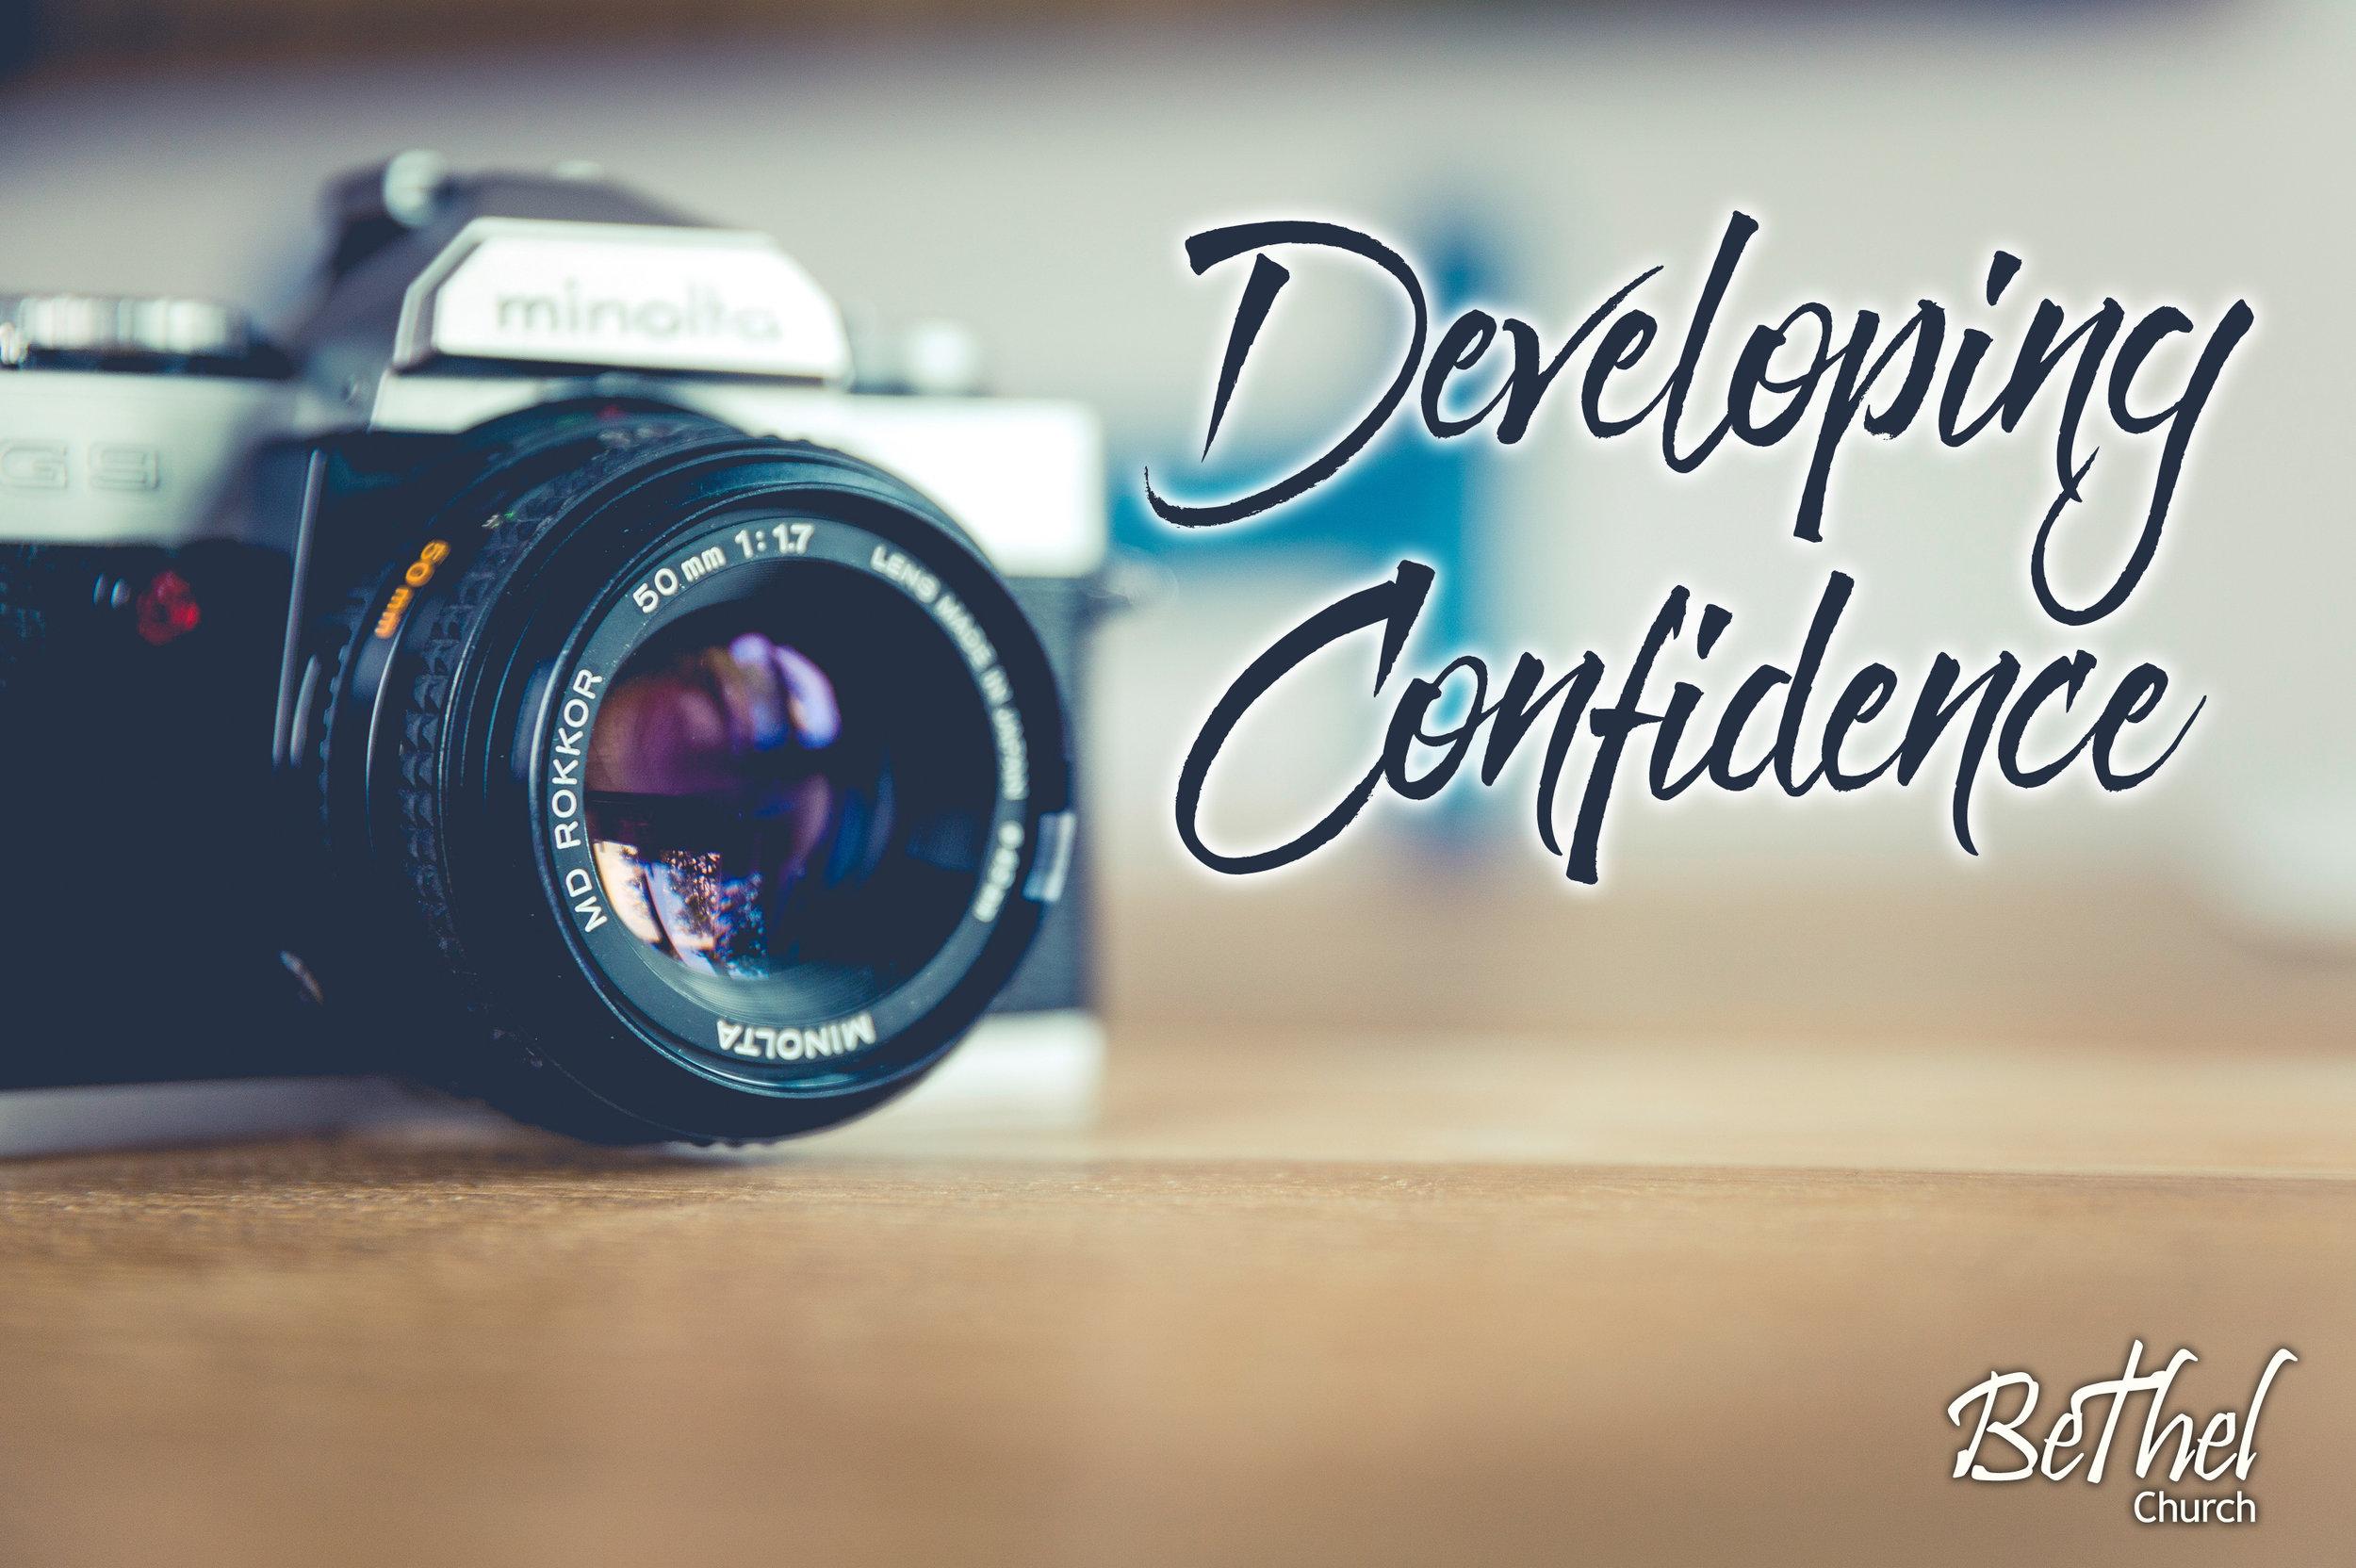 Developing Confidence.jpg